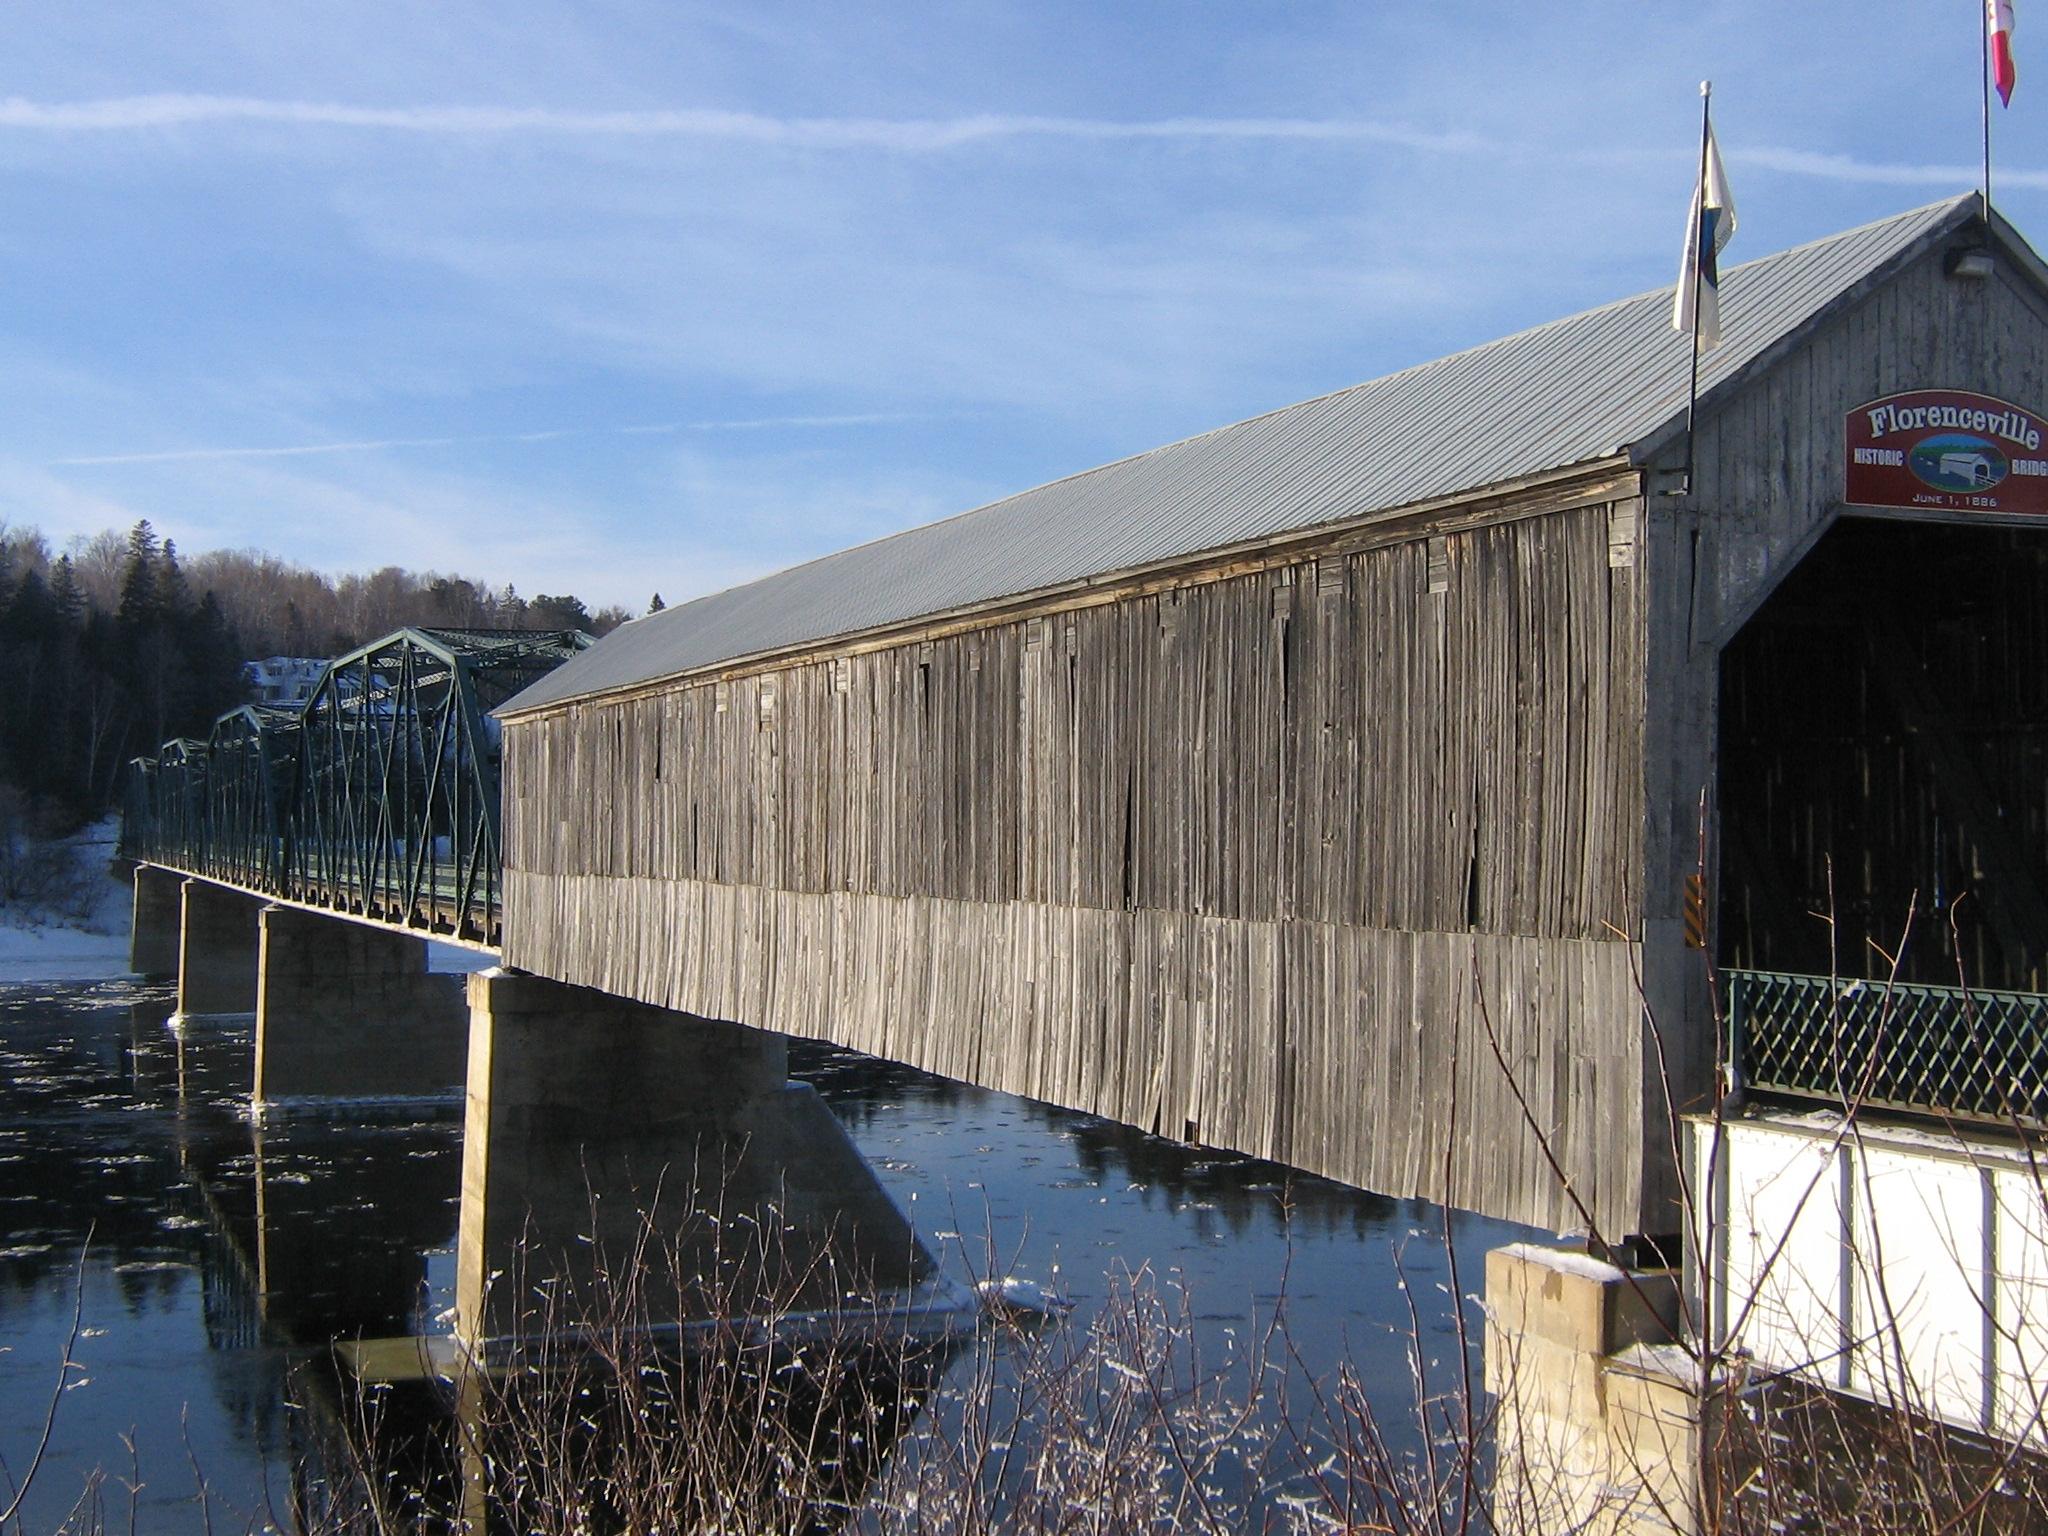 Florenceville-Bristol - Wikipedia